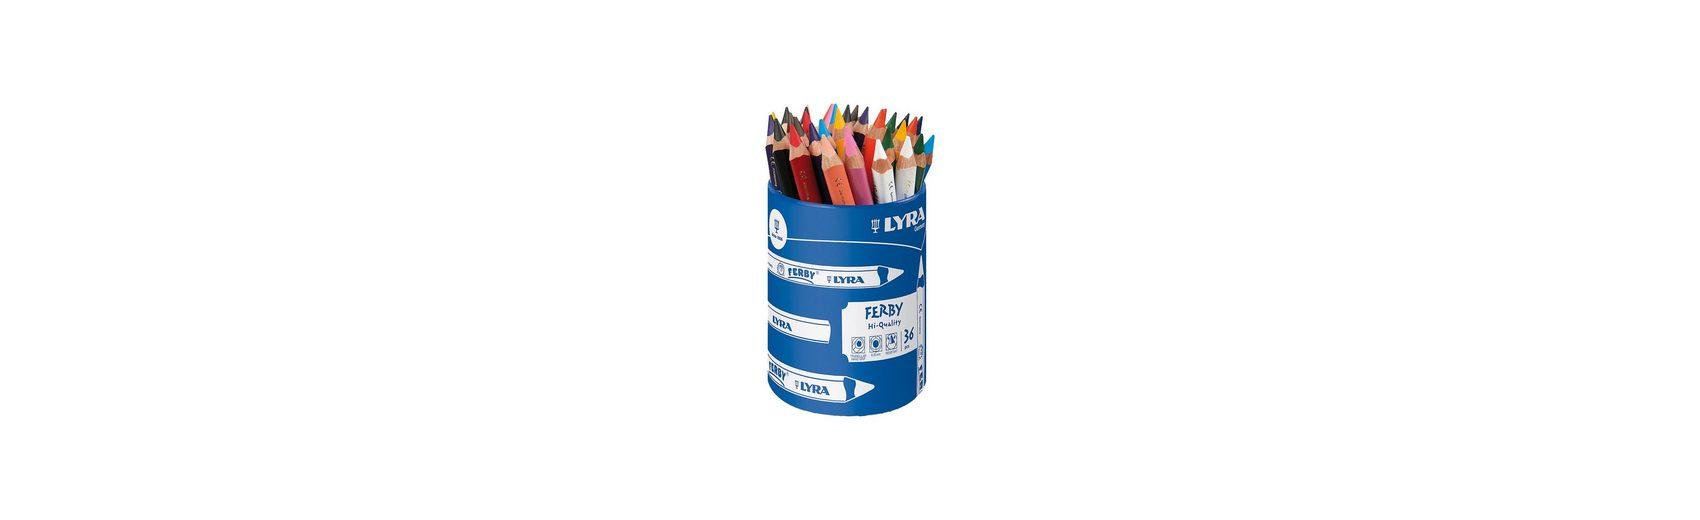 LYRA Buntstifte Ferby, 36 Farben